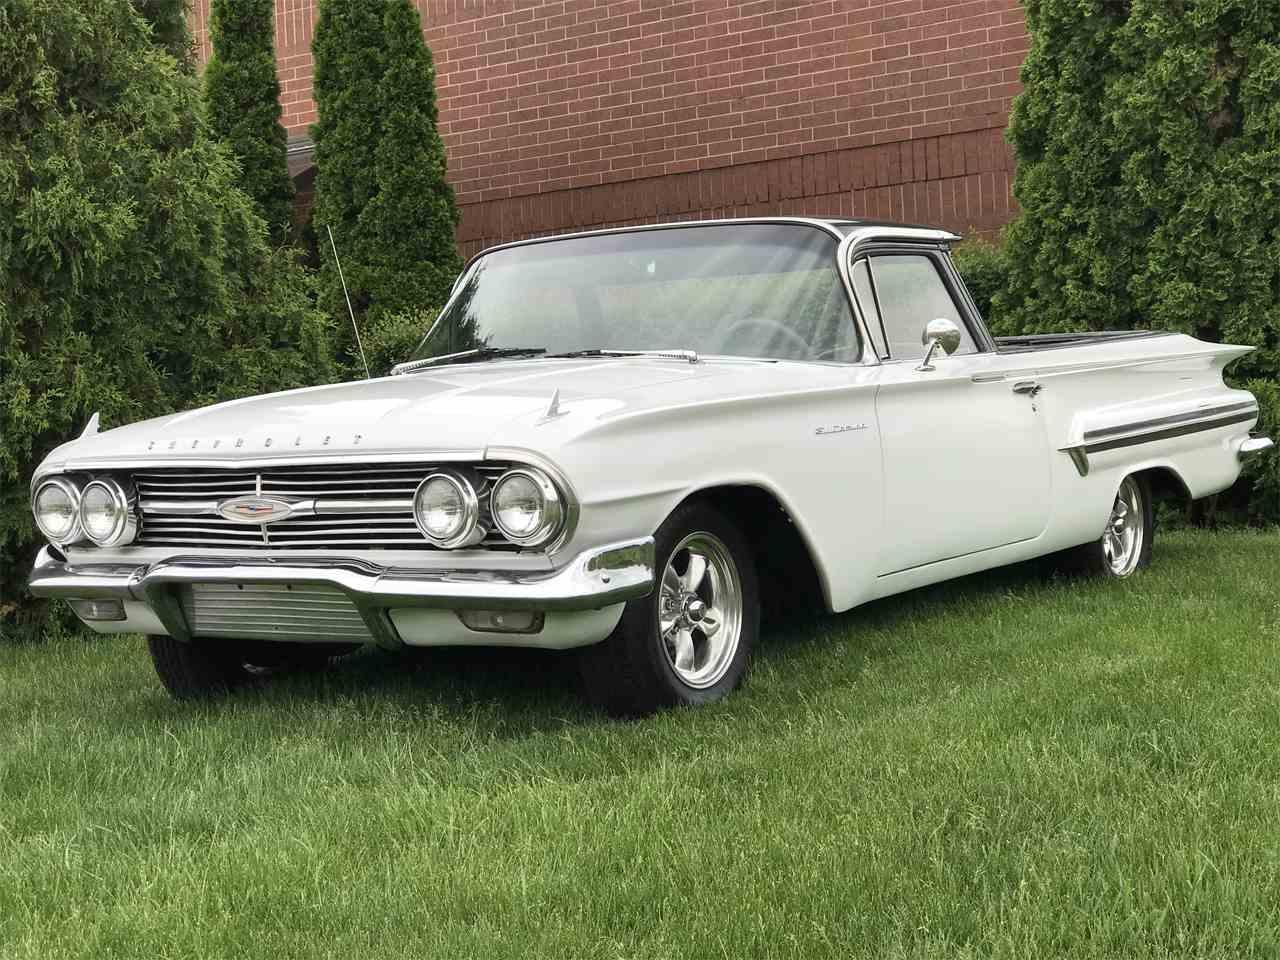 1960 Chevrolet El Camino For Sale Classiccars Com Cc